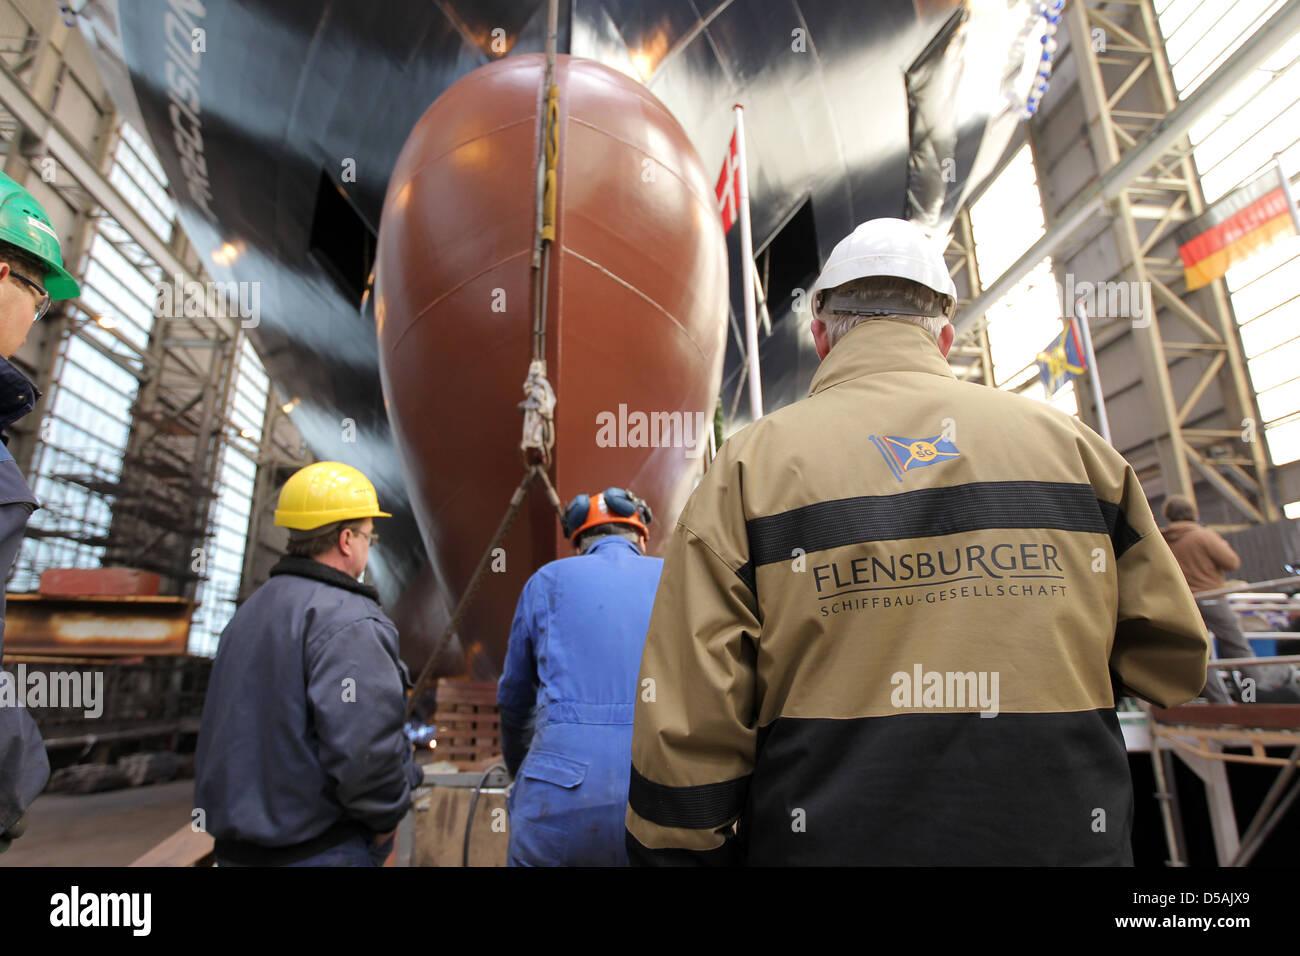 Flensburg, Germany, Flensburg shipbuilding workers Gesellschaft (FSG) accompany a stack overflow - Stock Image